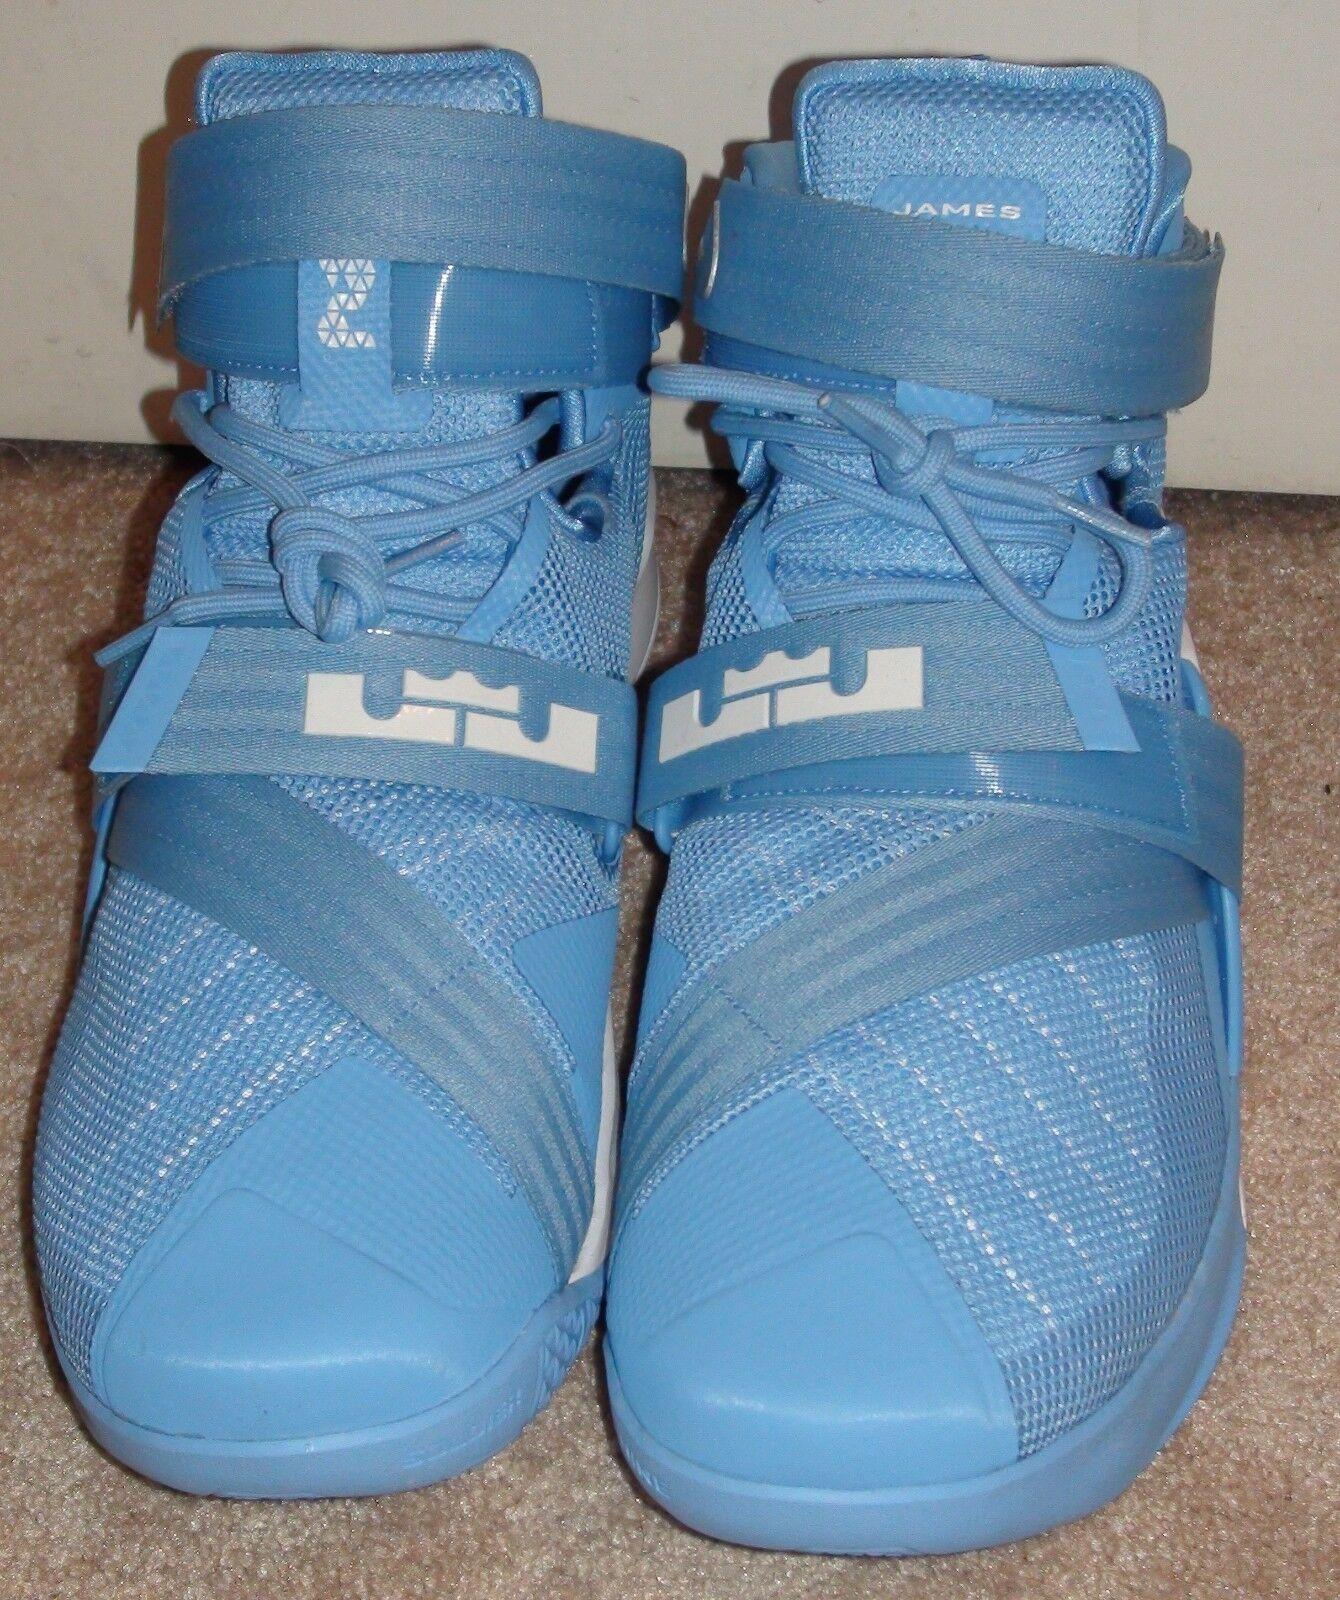 Nike Lebron Soldier IX 9 Basketball Shoes UNC North Carolina 813264 442 Sz 15.5